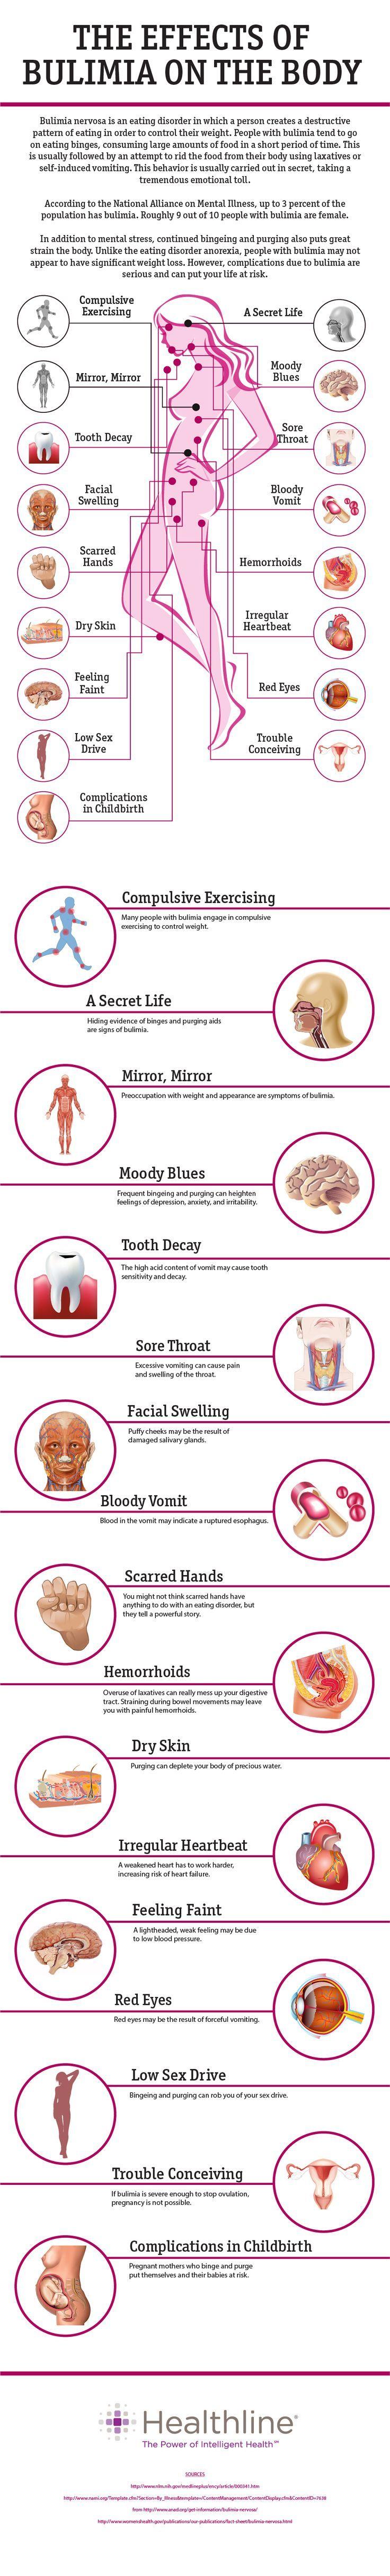 17 Effects of Bulimia on the Body= http://www.healthline.com/health/bulimia/effects- RAZONES POR LOS CUAL NO HACERLO